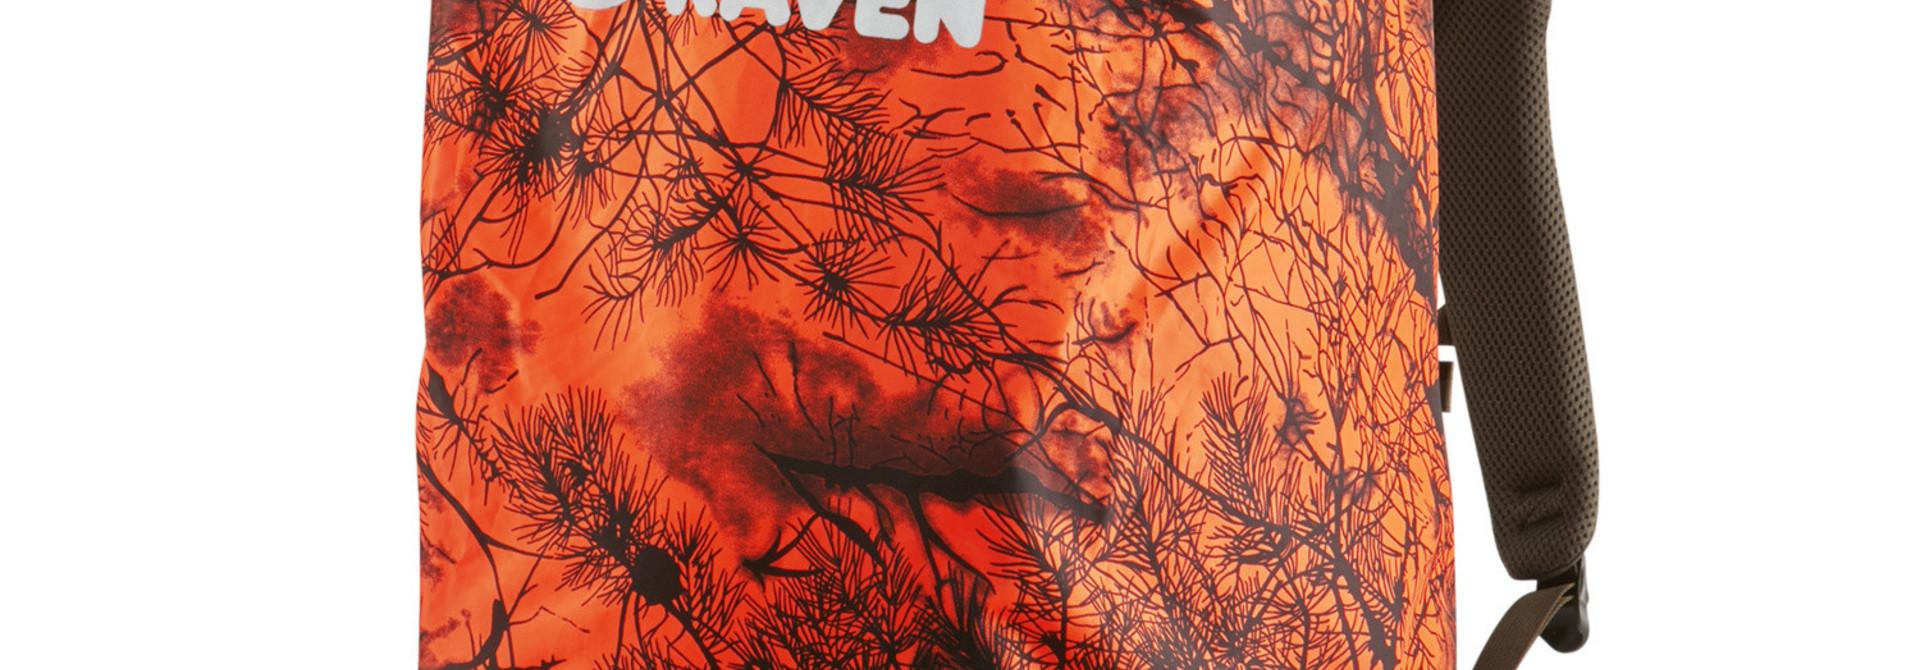 Fjällräven Hunting Rain Cover 16-28 Safety Orange